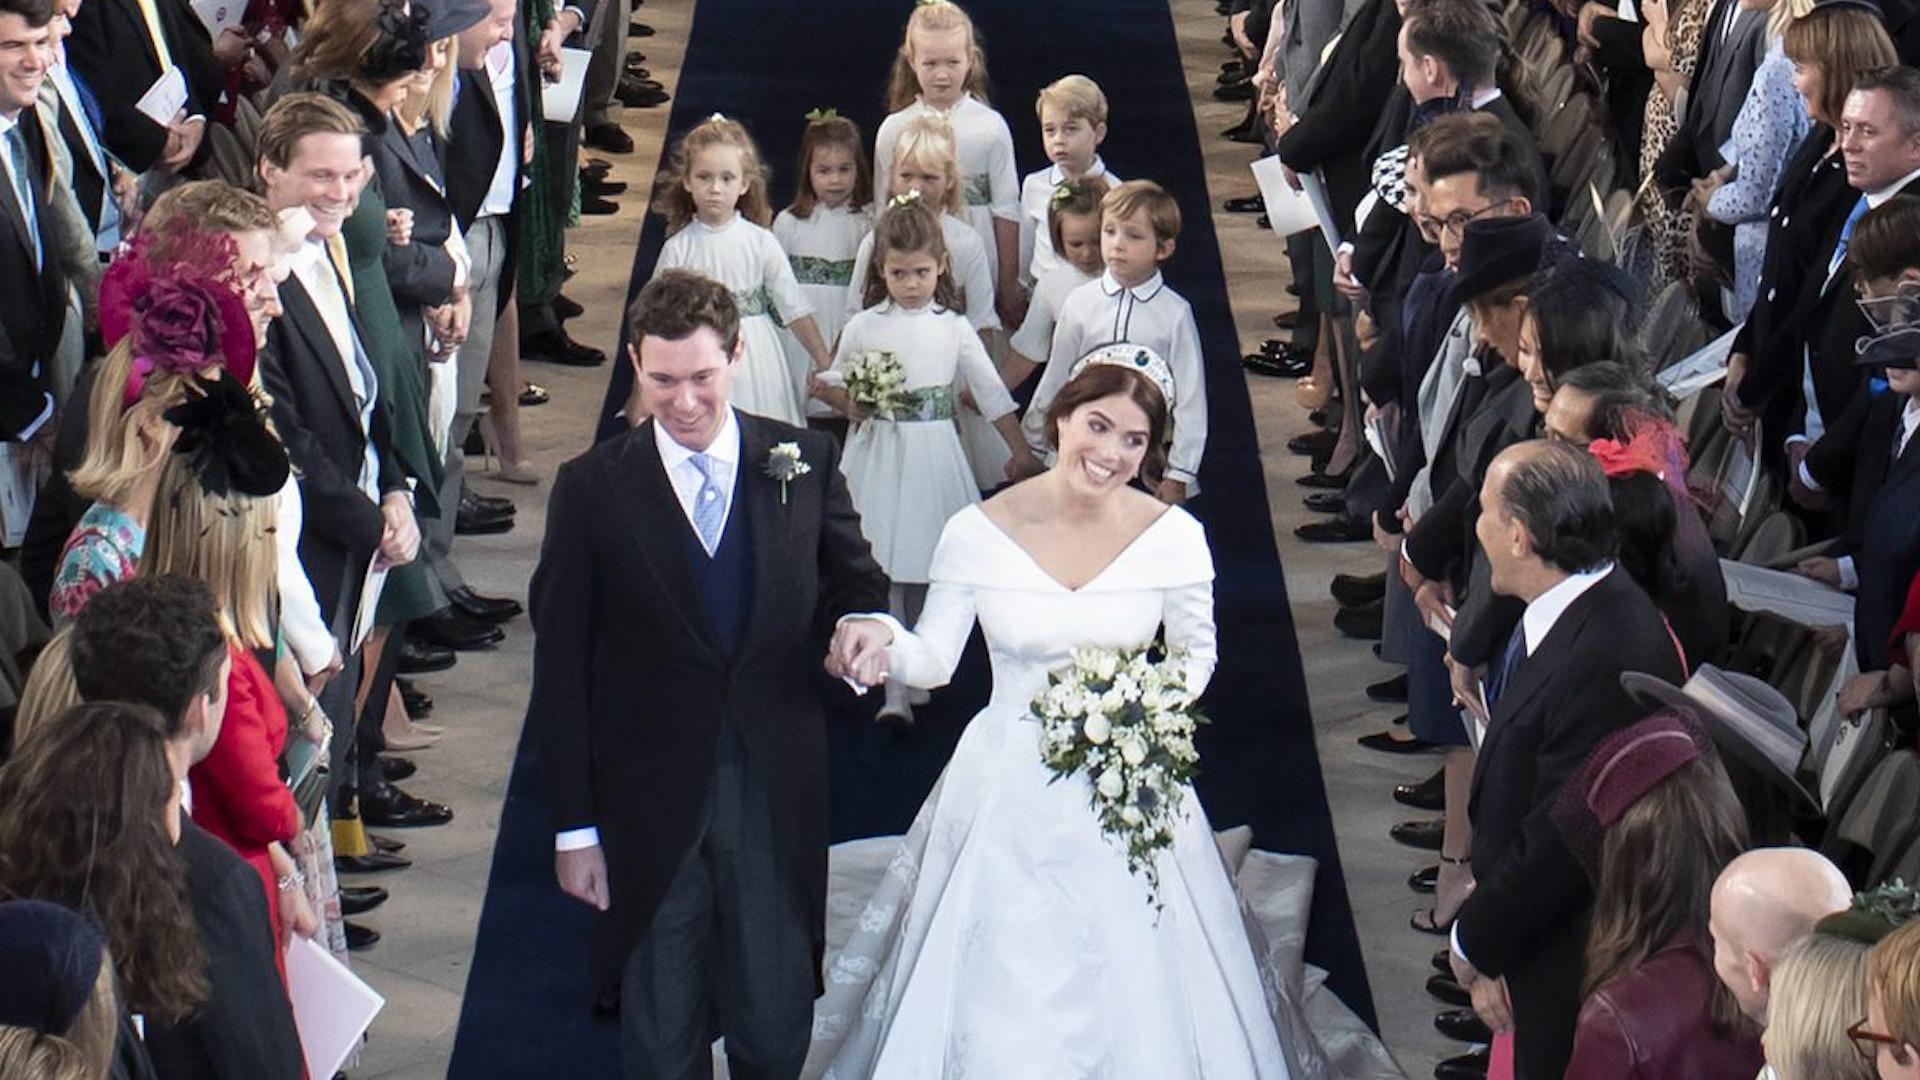 Princess Eugenie Wedding Televised.Highlights Of Princess Eugenie S Wedding To Jack Brooksbank